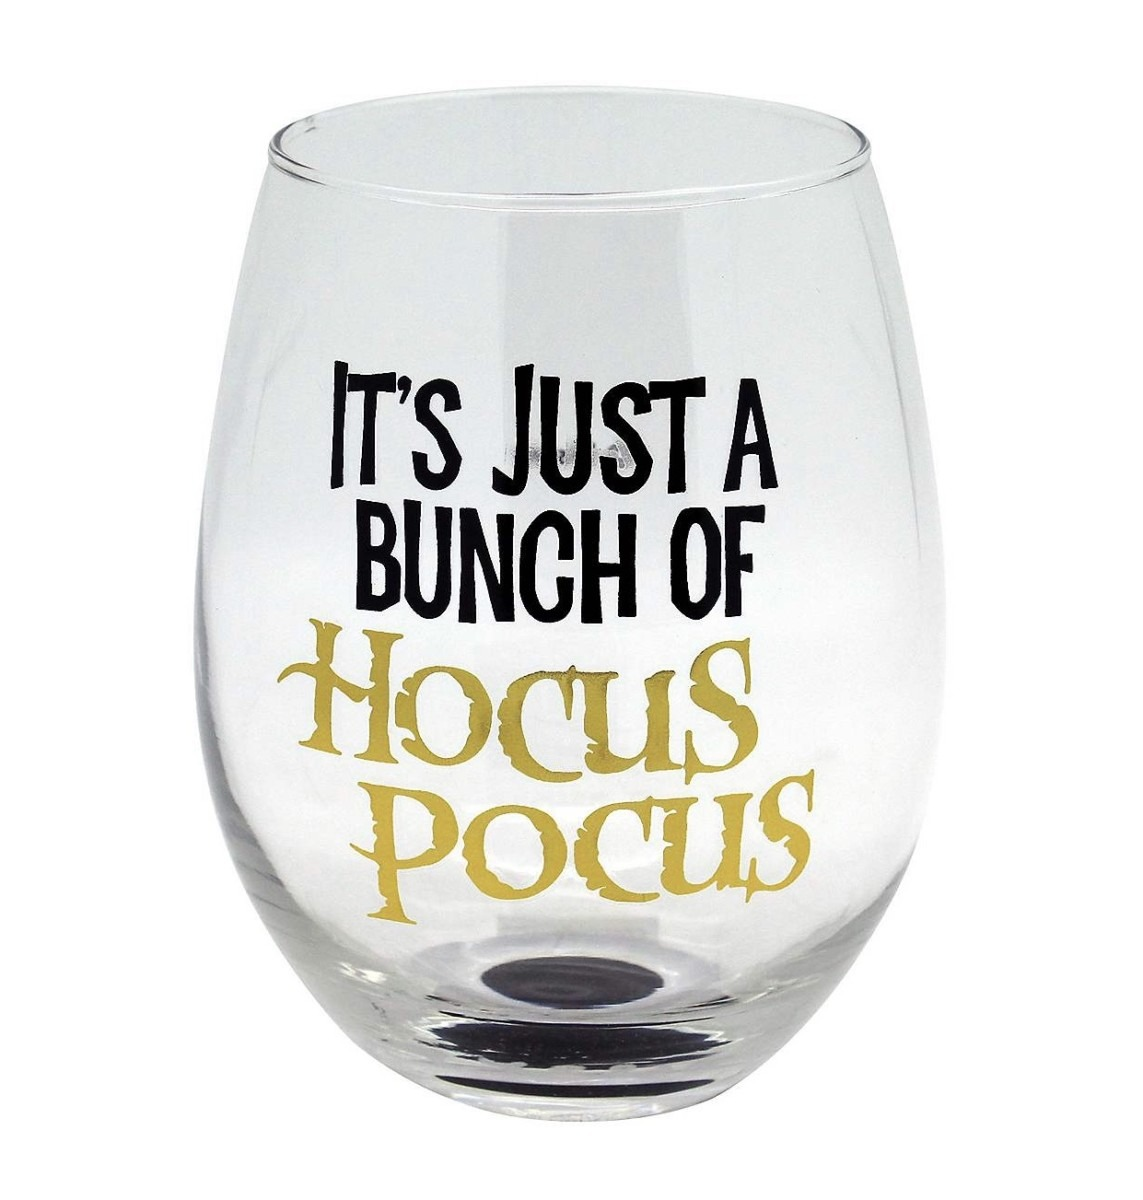 Spirit Halloween Just Dropped 'Hocus Pocus' Wine Glasses! Details Below! 2